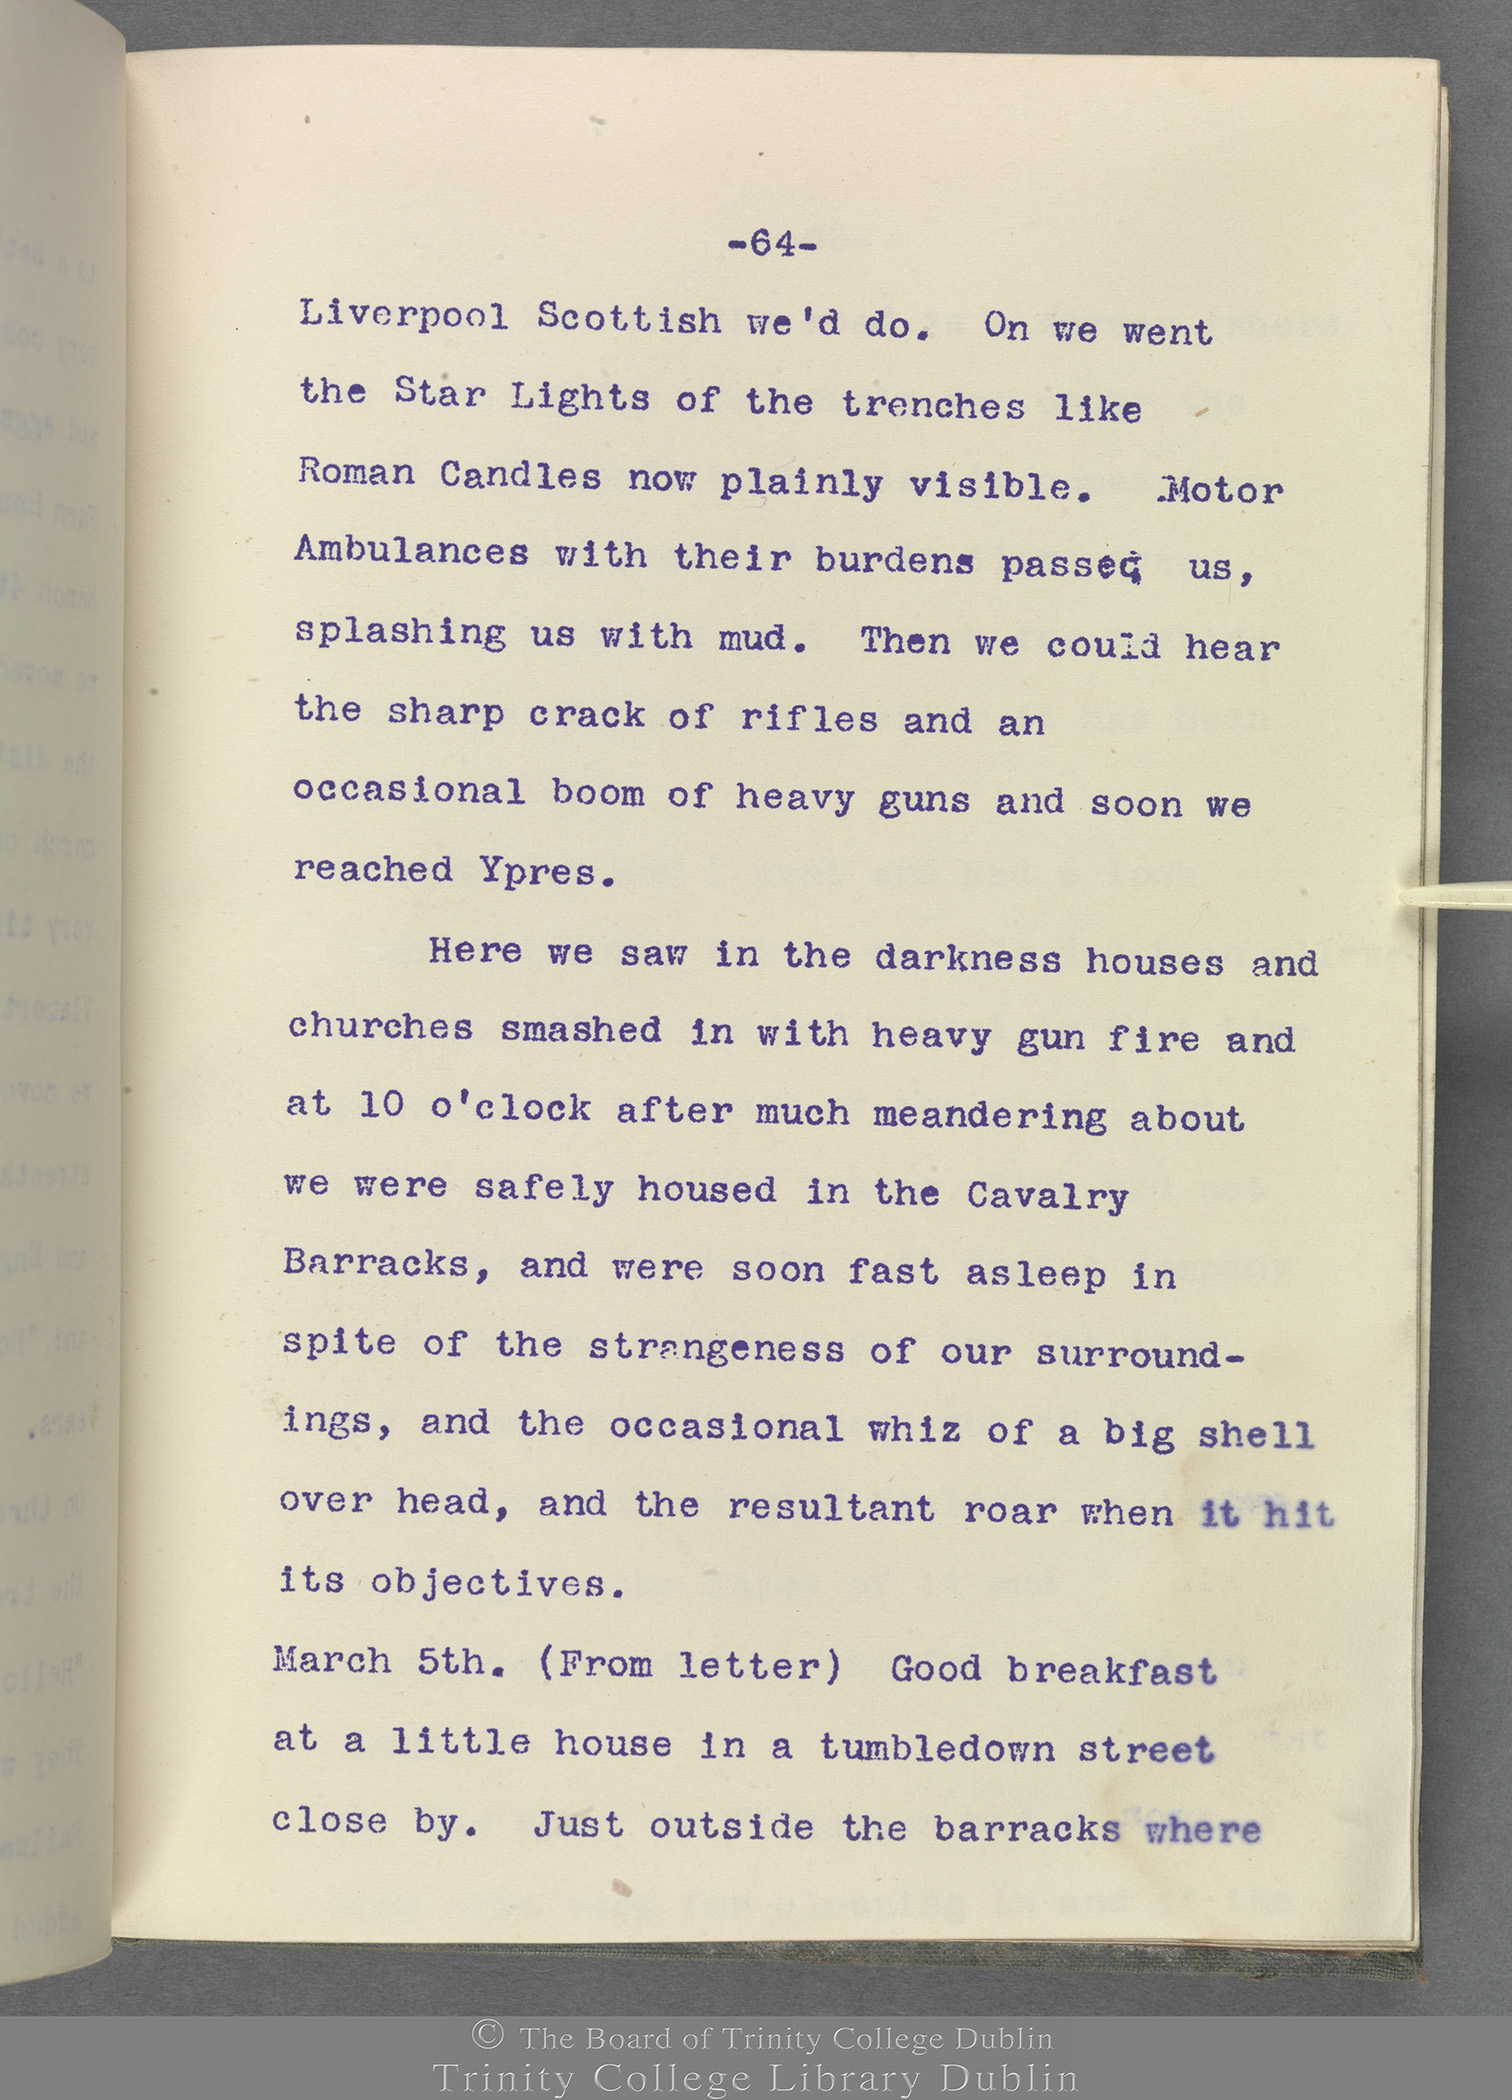 TCD MS 10853 folio 64 recto